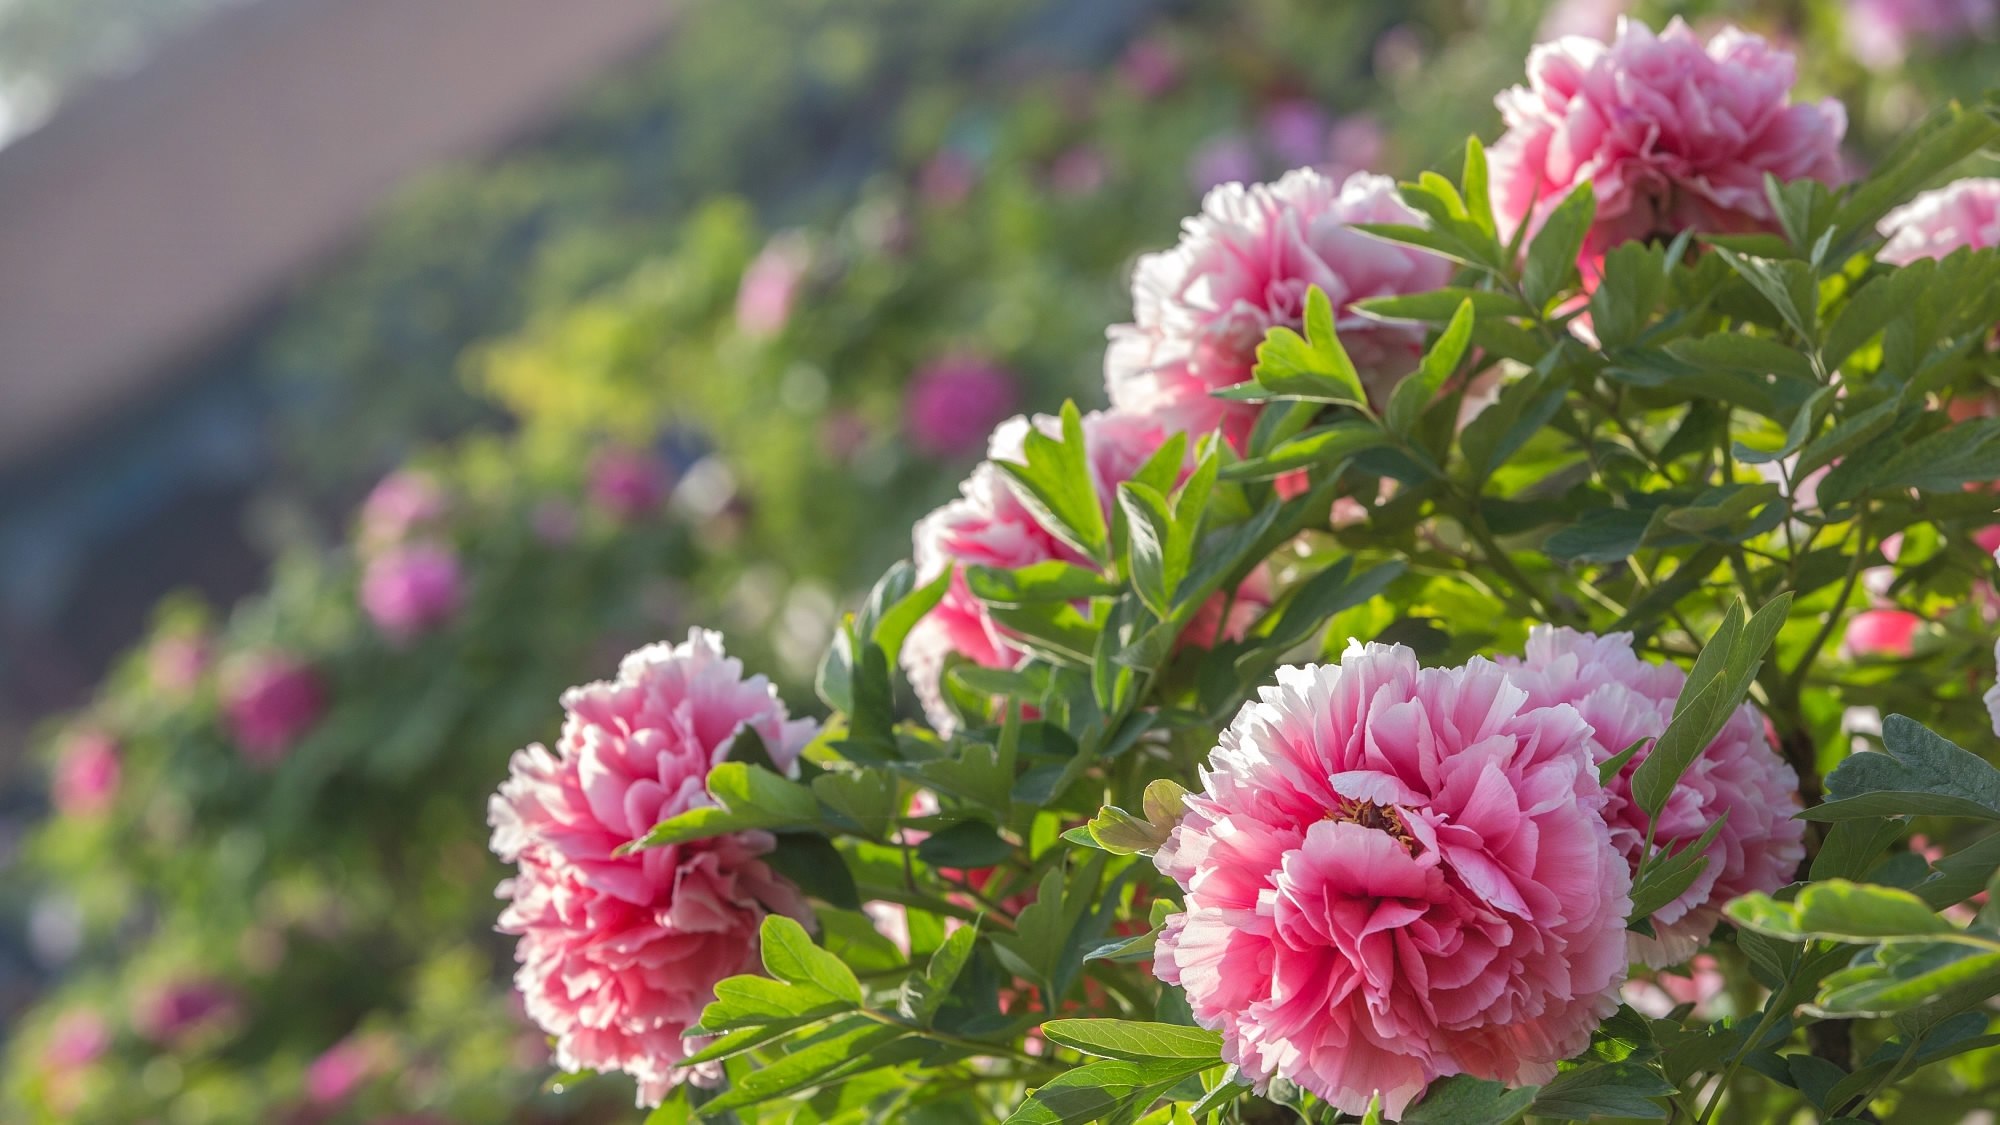 Peonies Chinas Former National Flower Bloom In Imperial Garden Cgtn